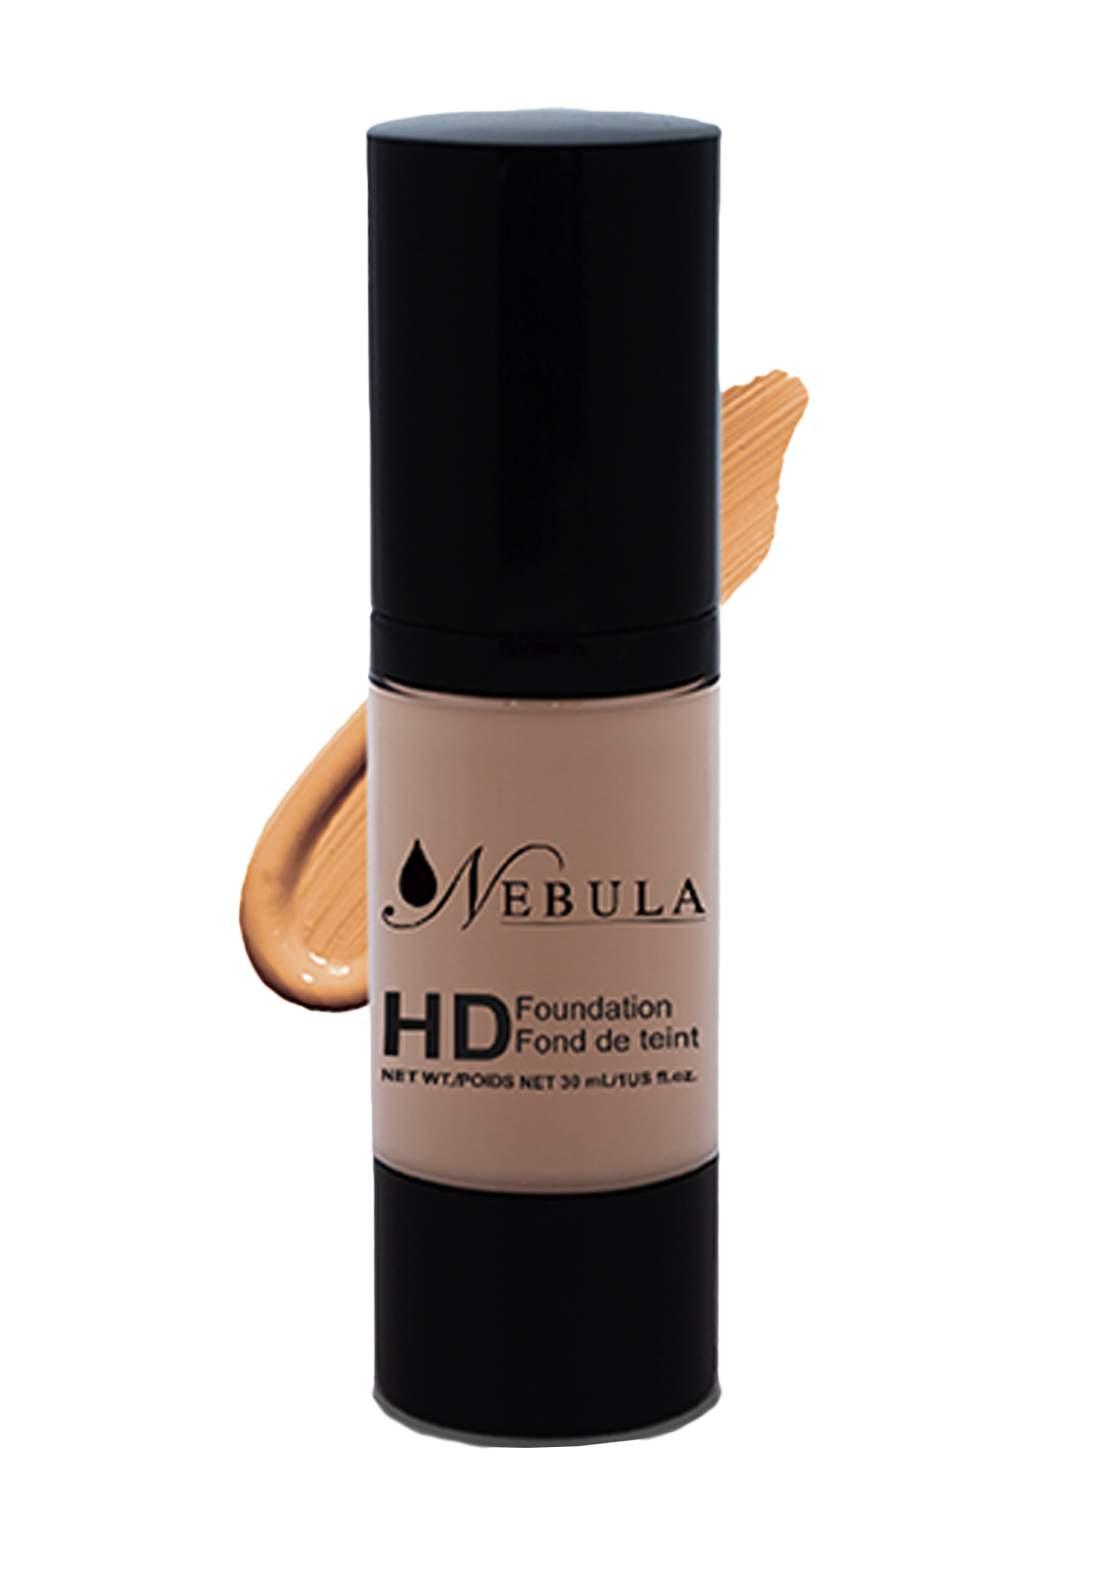 Nebula HD Liquid Fondation-30ml-152-Medium Ivory اساس